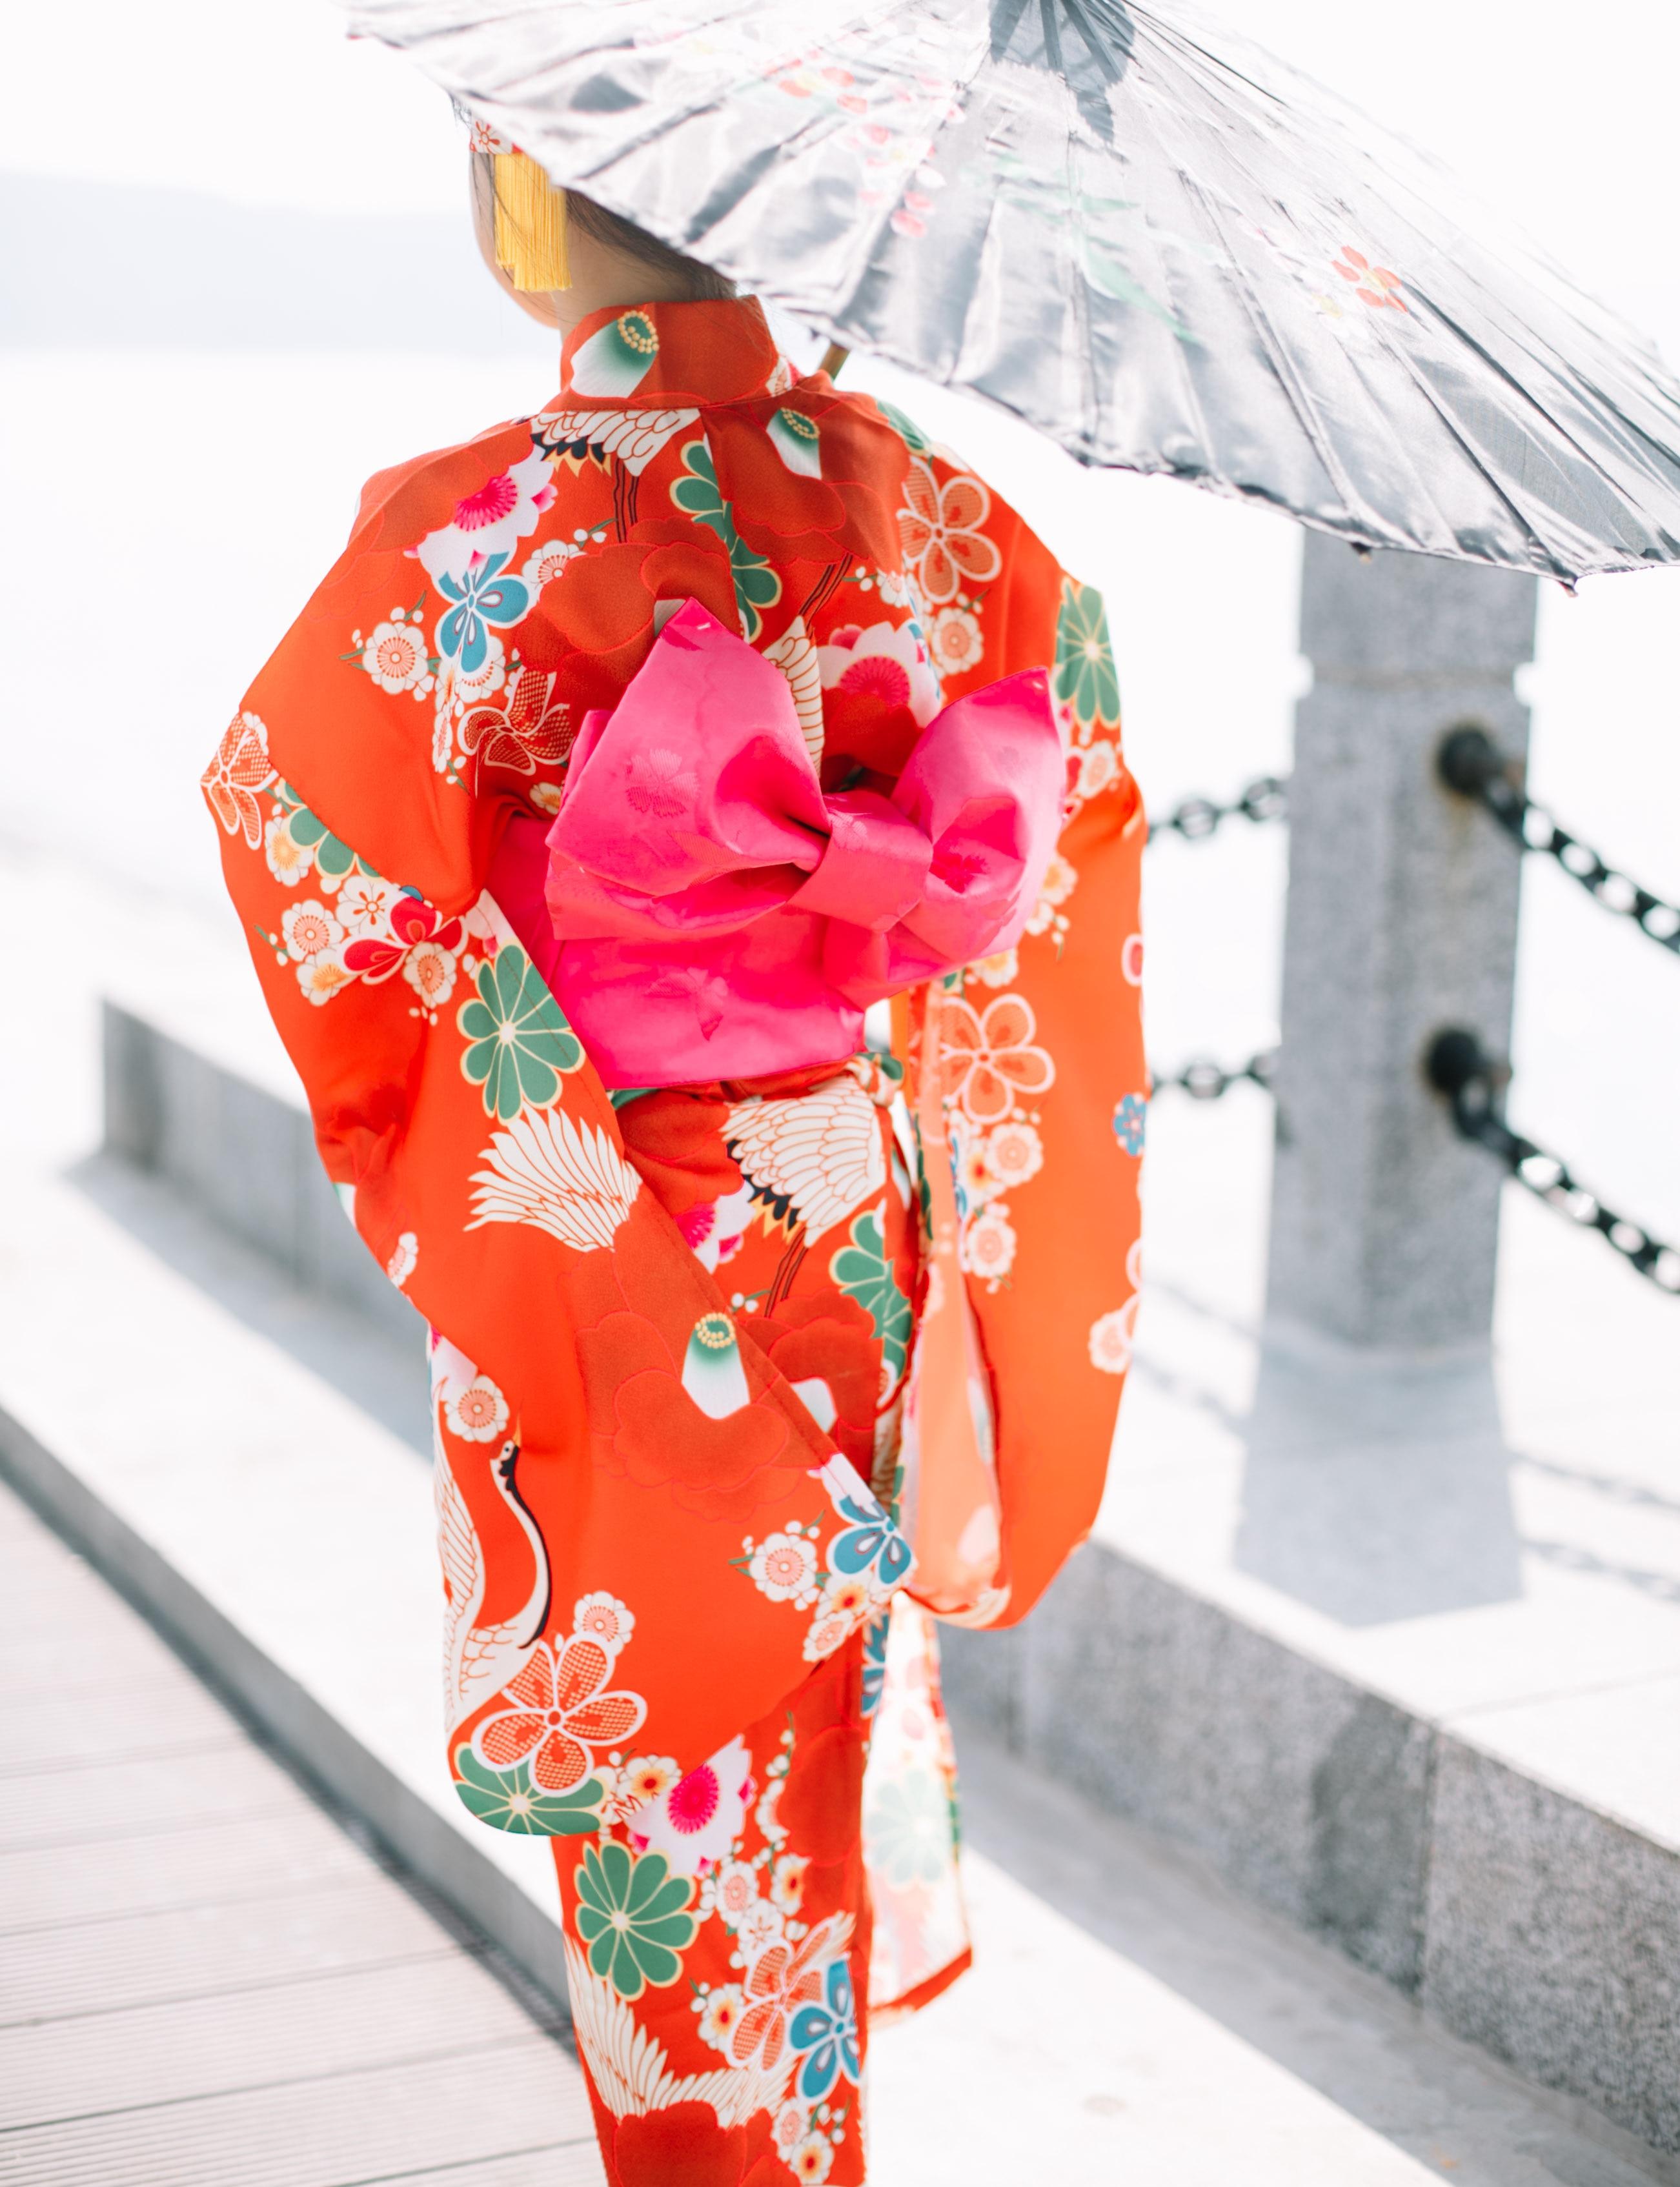 2018 autumn black japanese national baby girl kimono dress children yukata with obi kid girl performance dance dress flower obi tie outerwear with epaulet detail